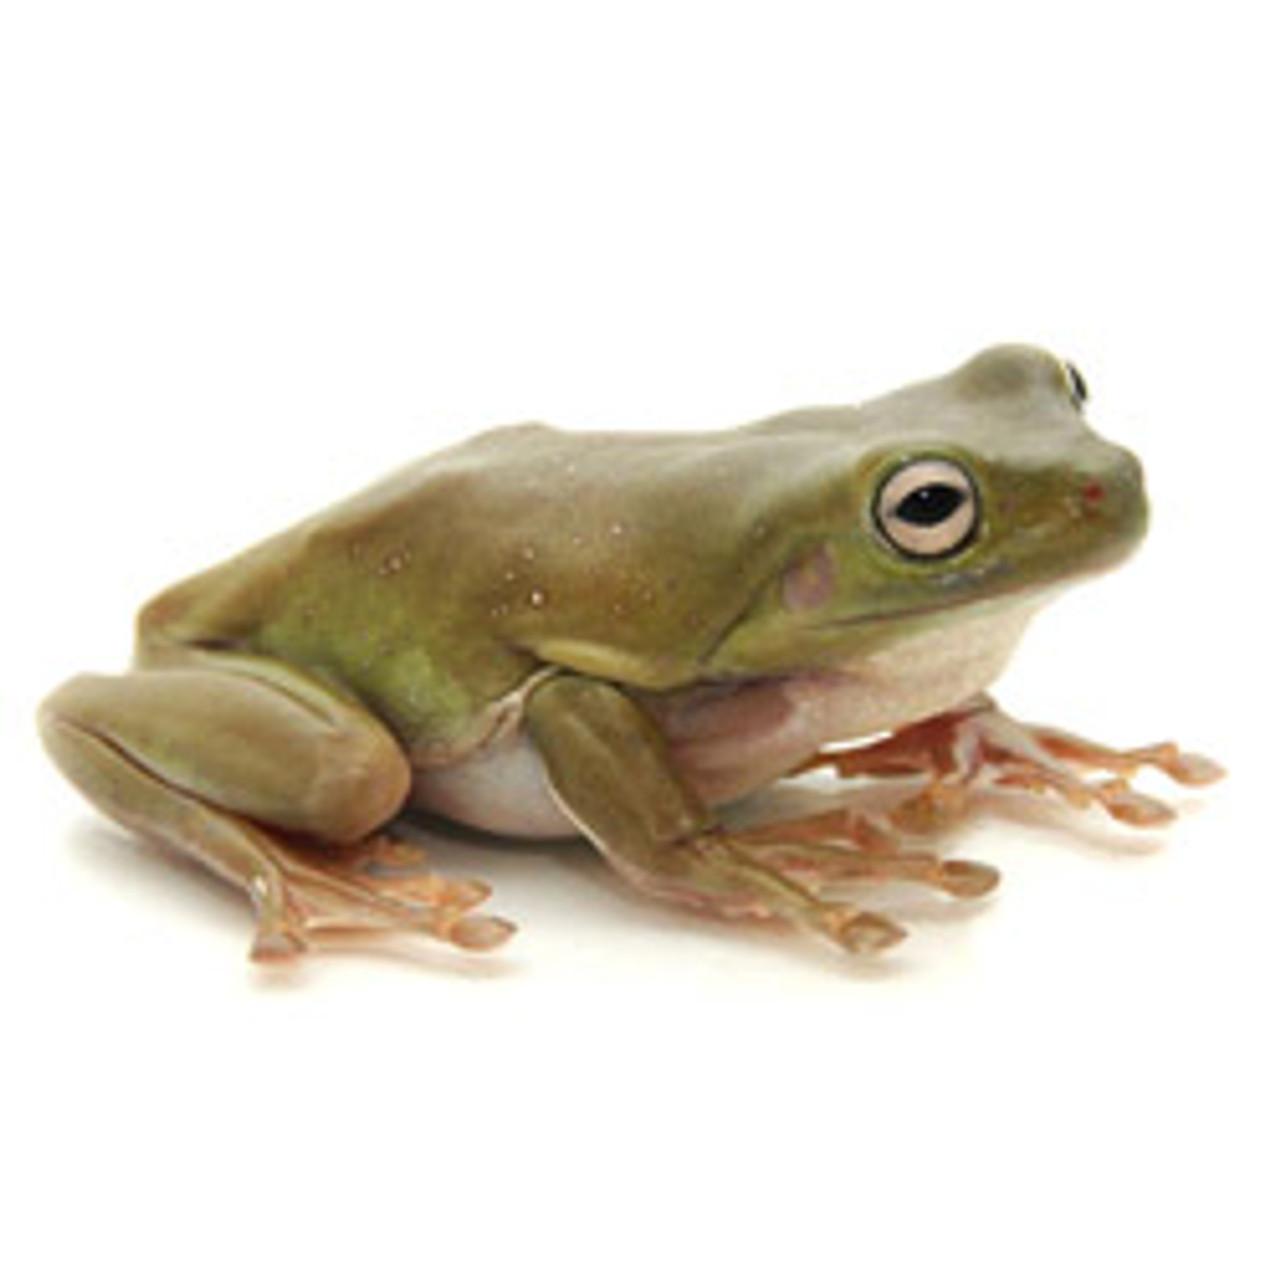 Dumpy / White's Tree Frog (Litoria caruela) Adult